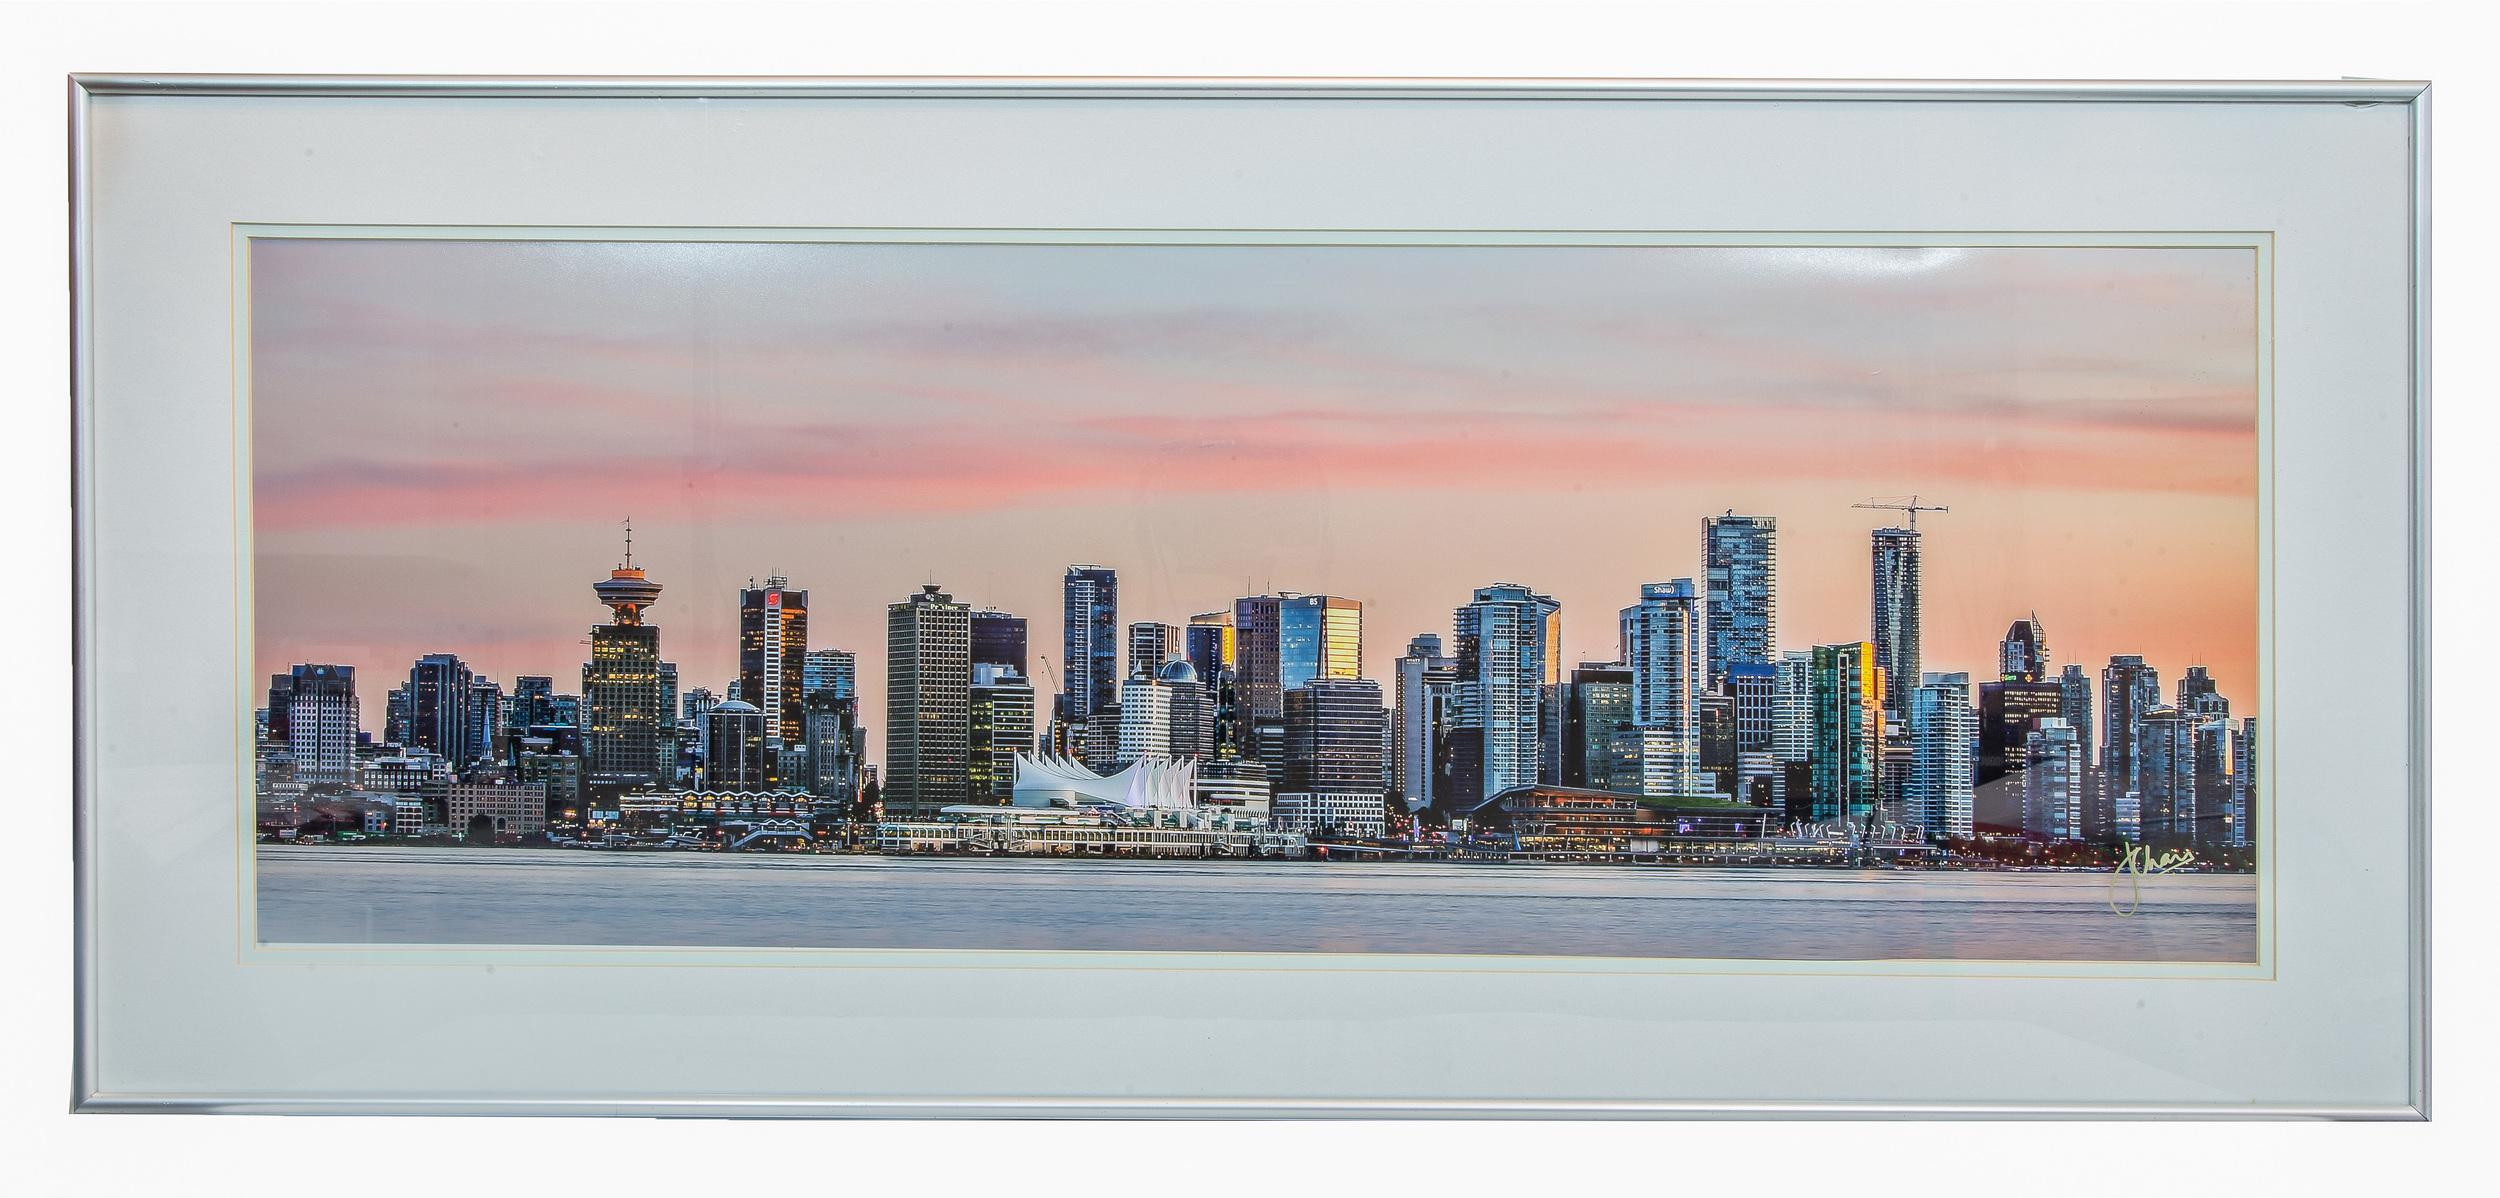 Vancouver Sunset Skyline (Framed)